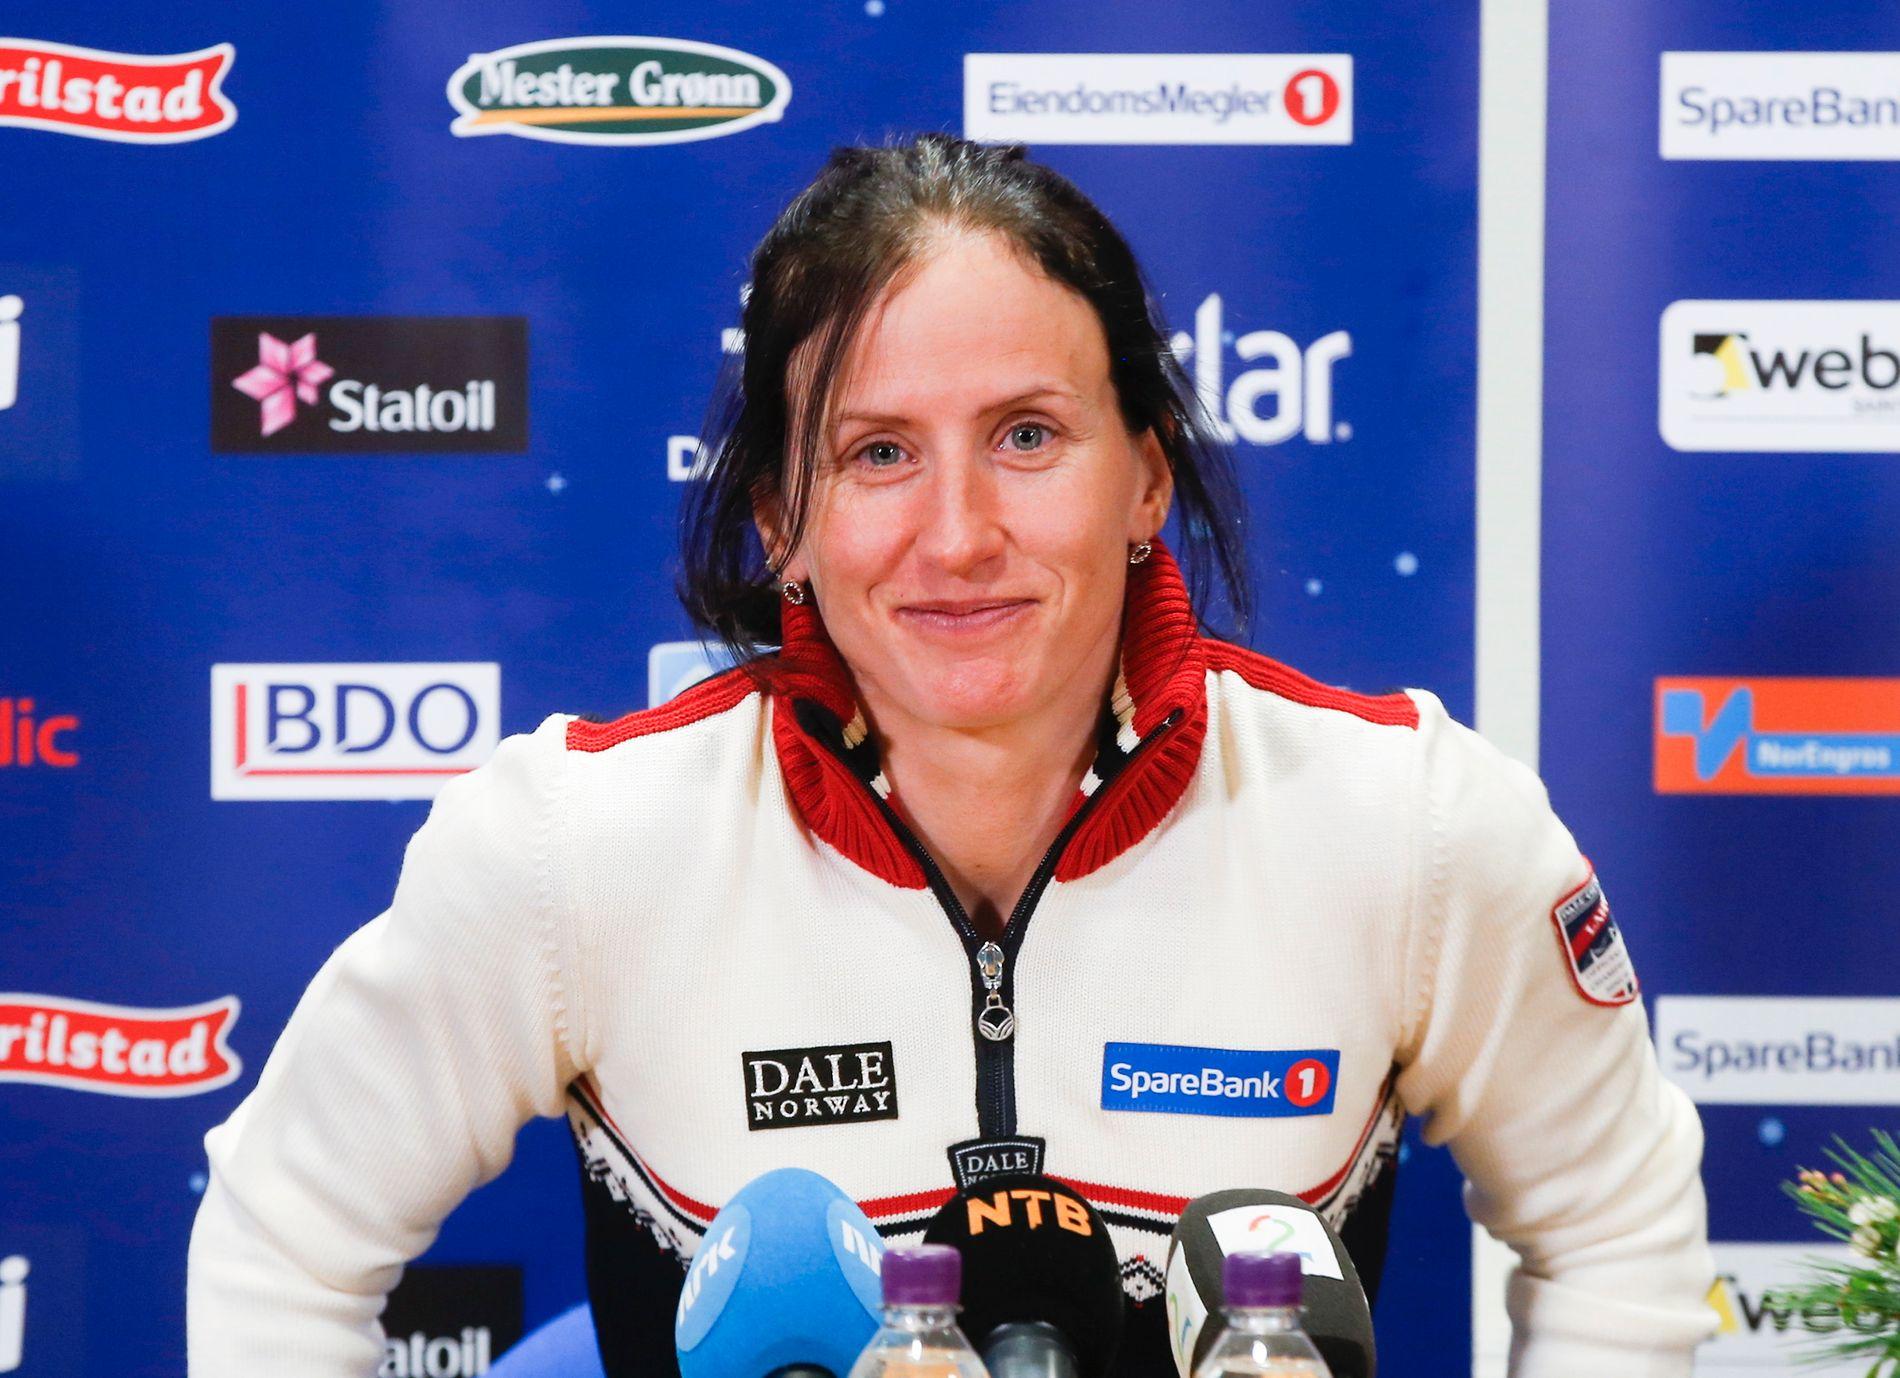 FORKJØLET: Marit Bjørgen (36) er usikker på om hun er i stand til å stille til start på Beitostølen i morgen, lørdag.